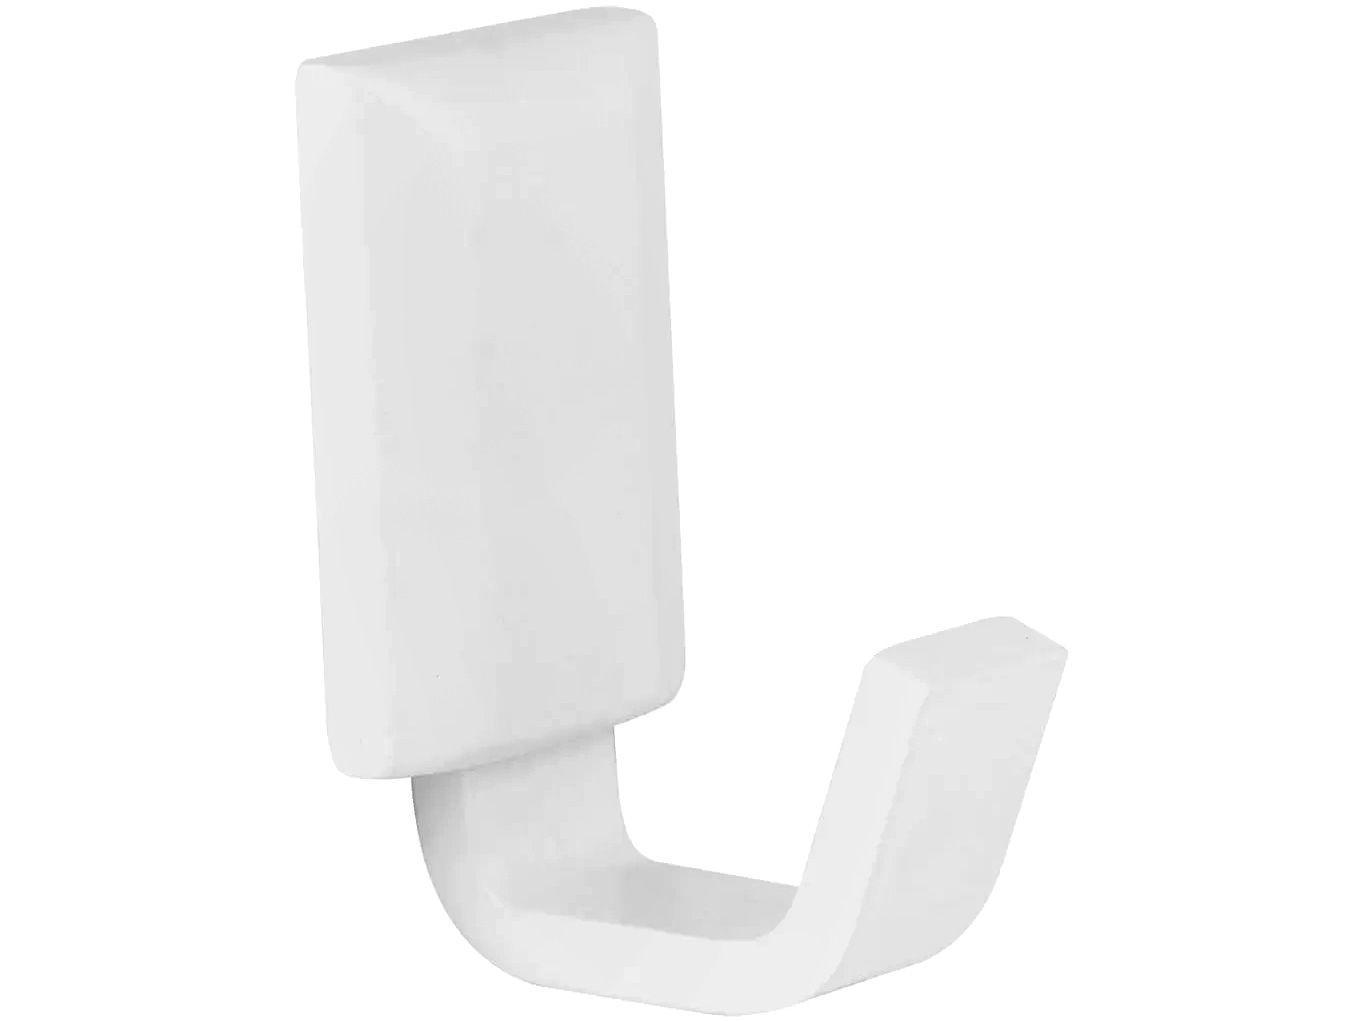 Cabide para Banheiro Branco Fosco Classic White - CW1060 Ducon Metais